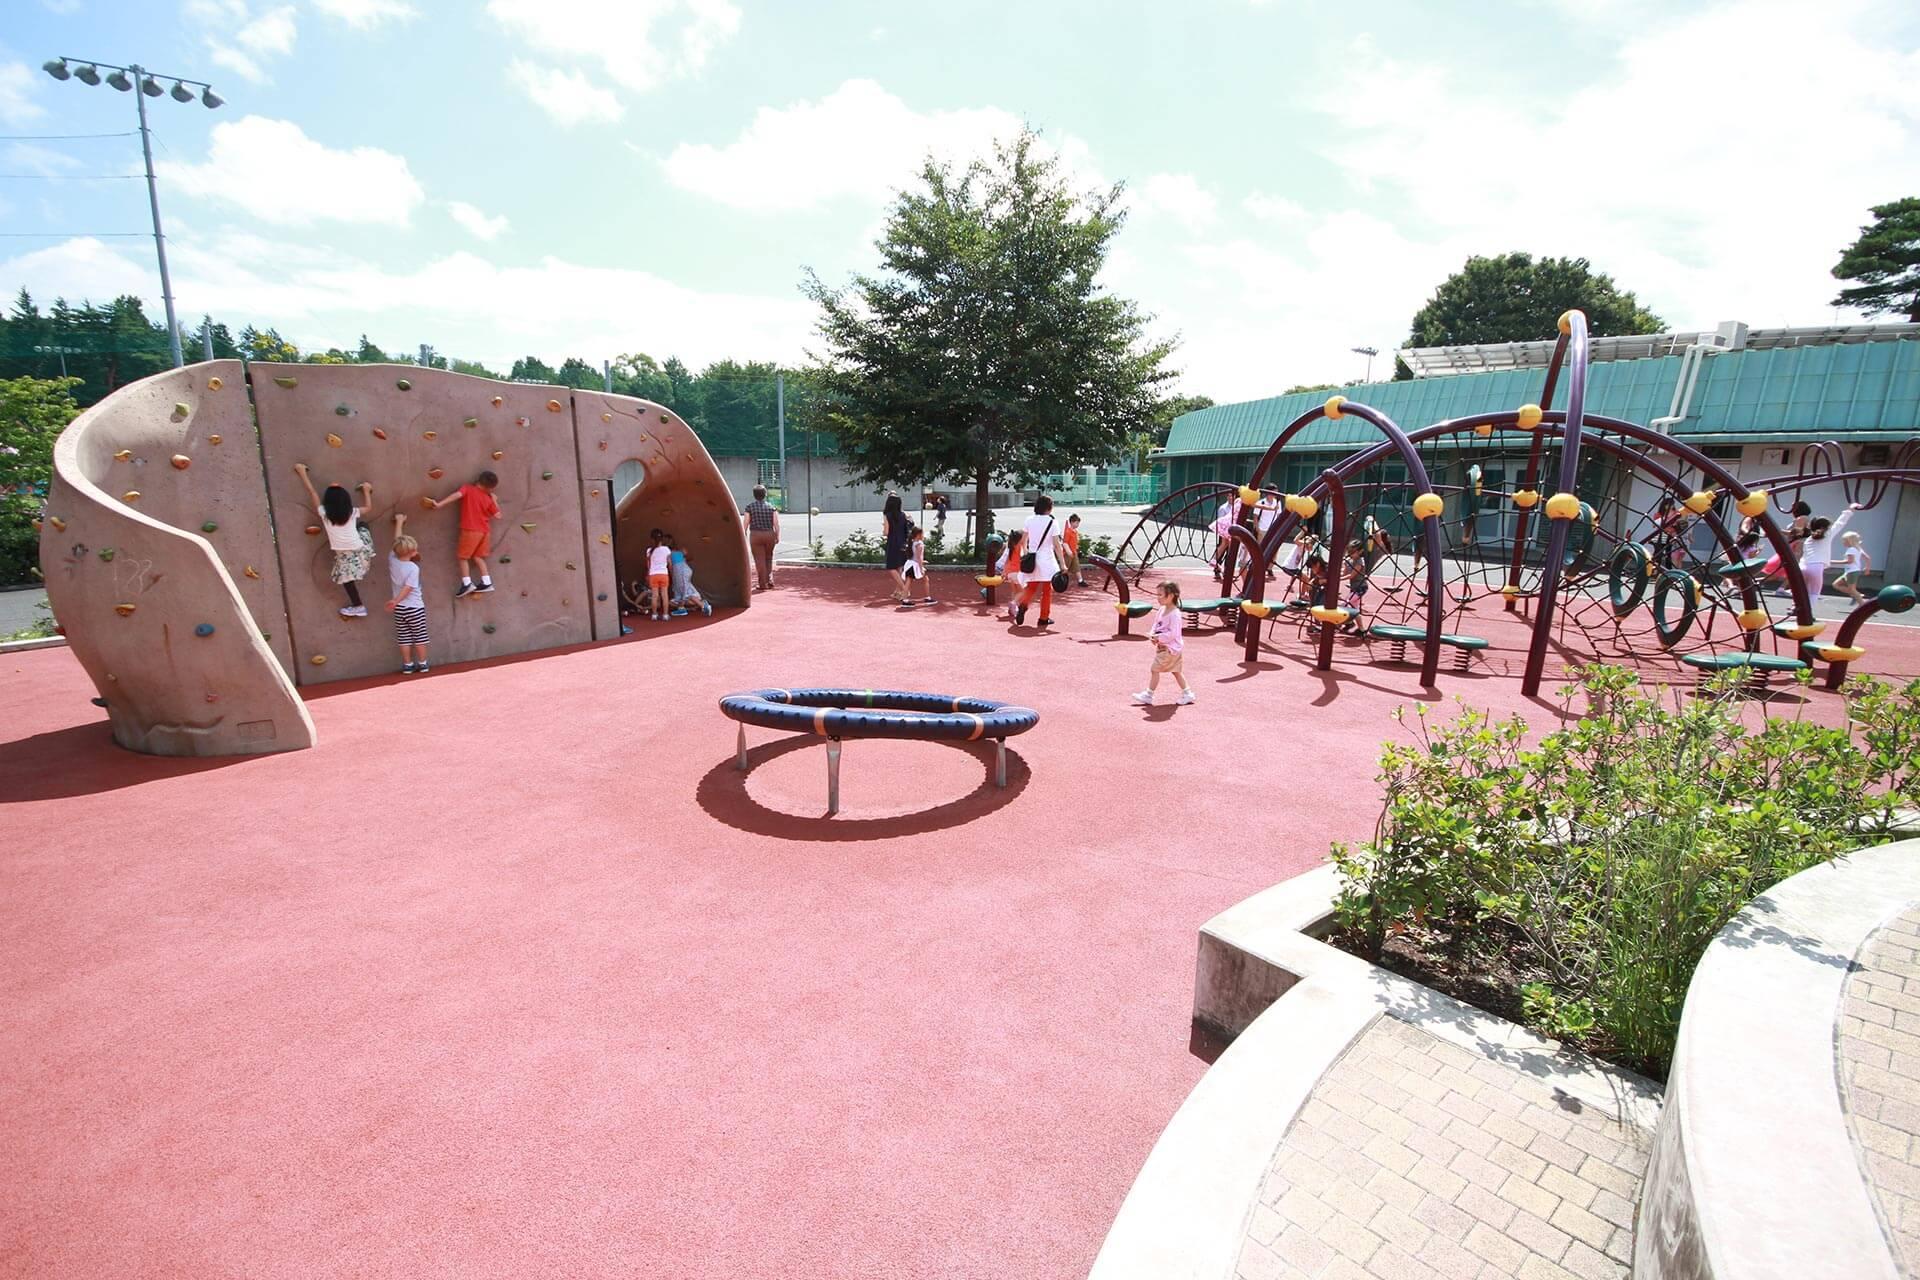 The Elementary School Playground